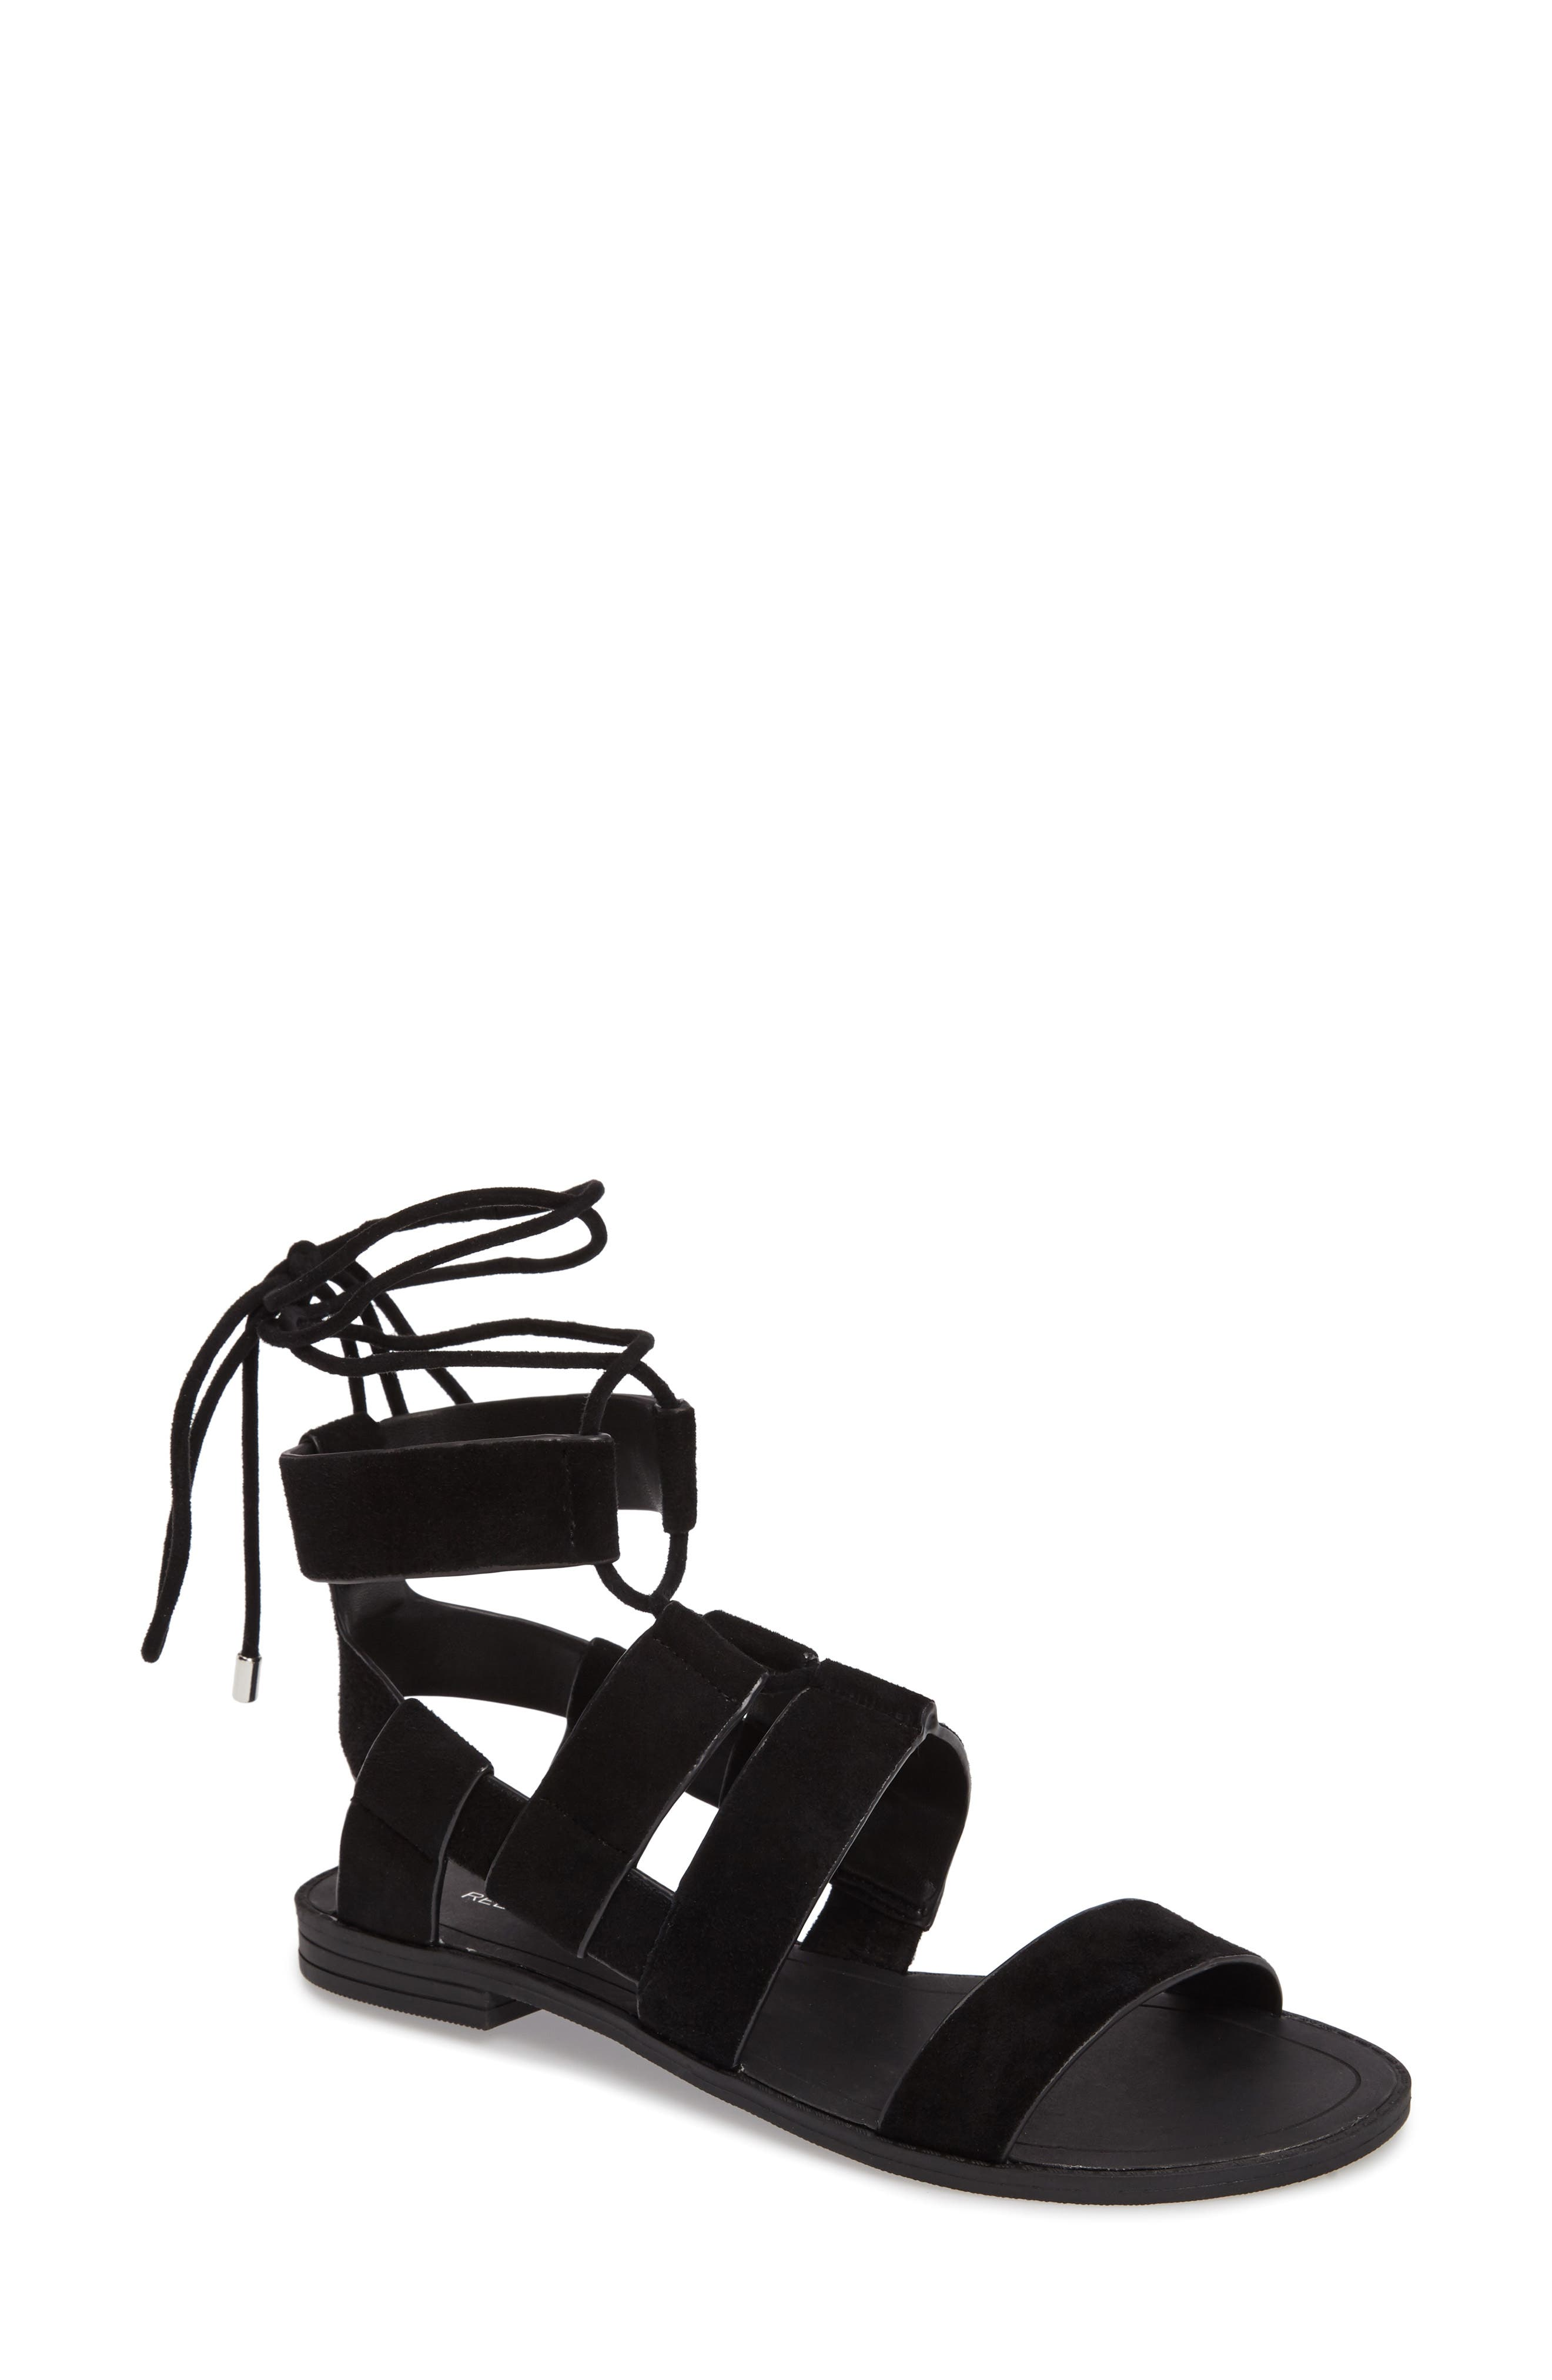 Giada Strappy Sandal,                         Main,                         color, 001